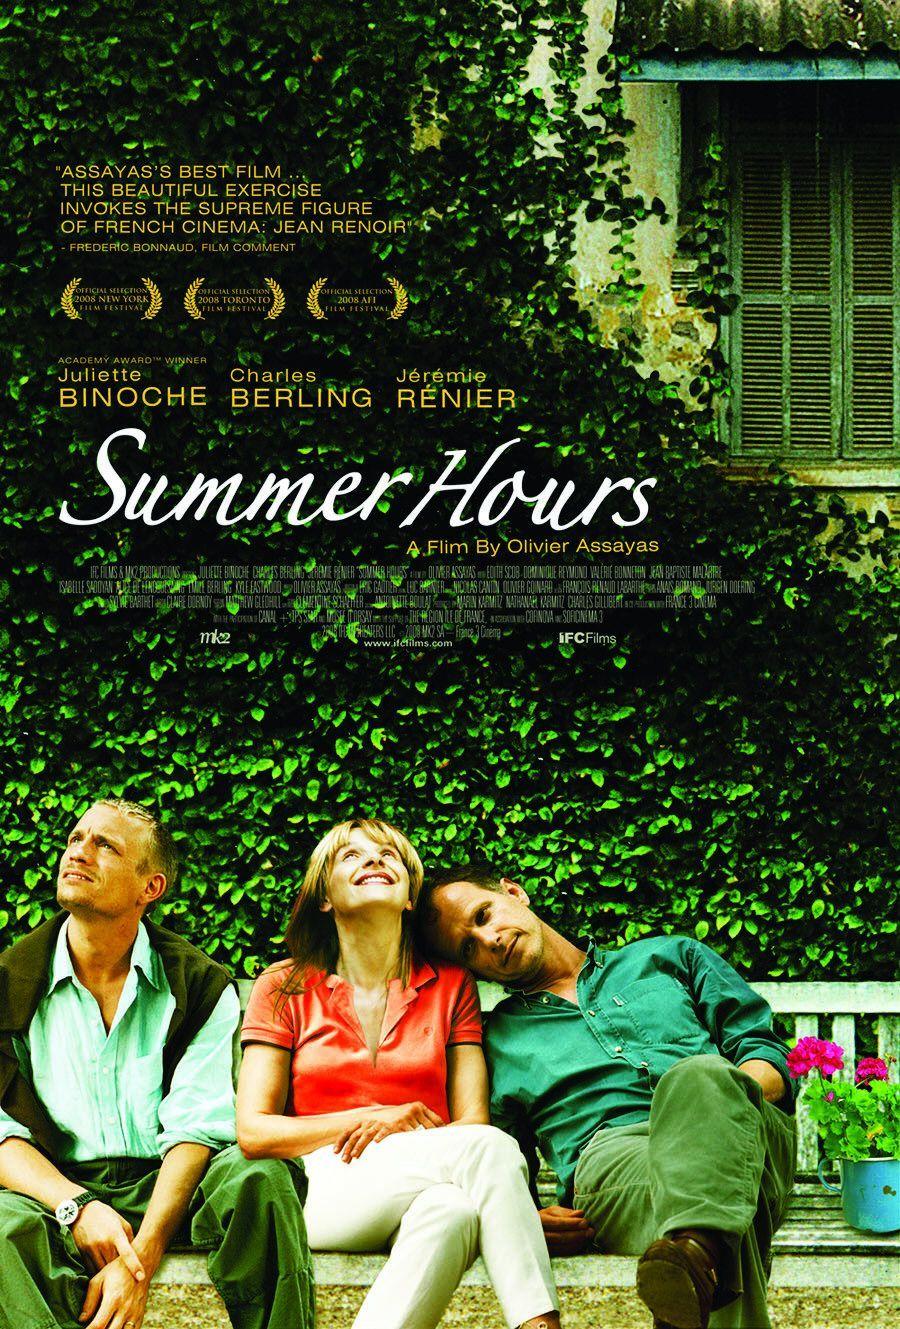 L Heure D Ete Summer Hours 2008 Olivier Assayas With Images